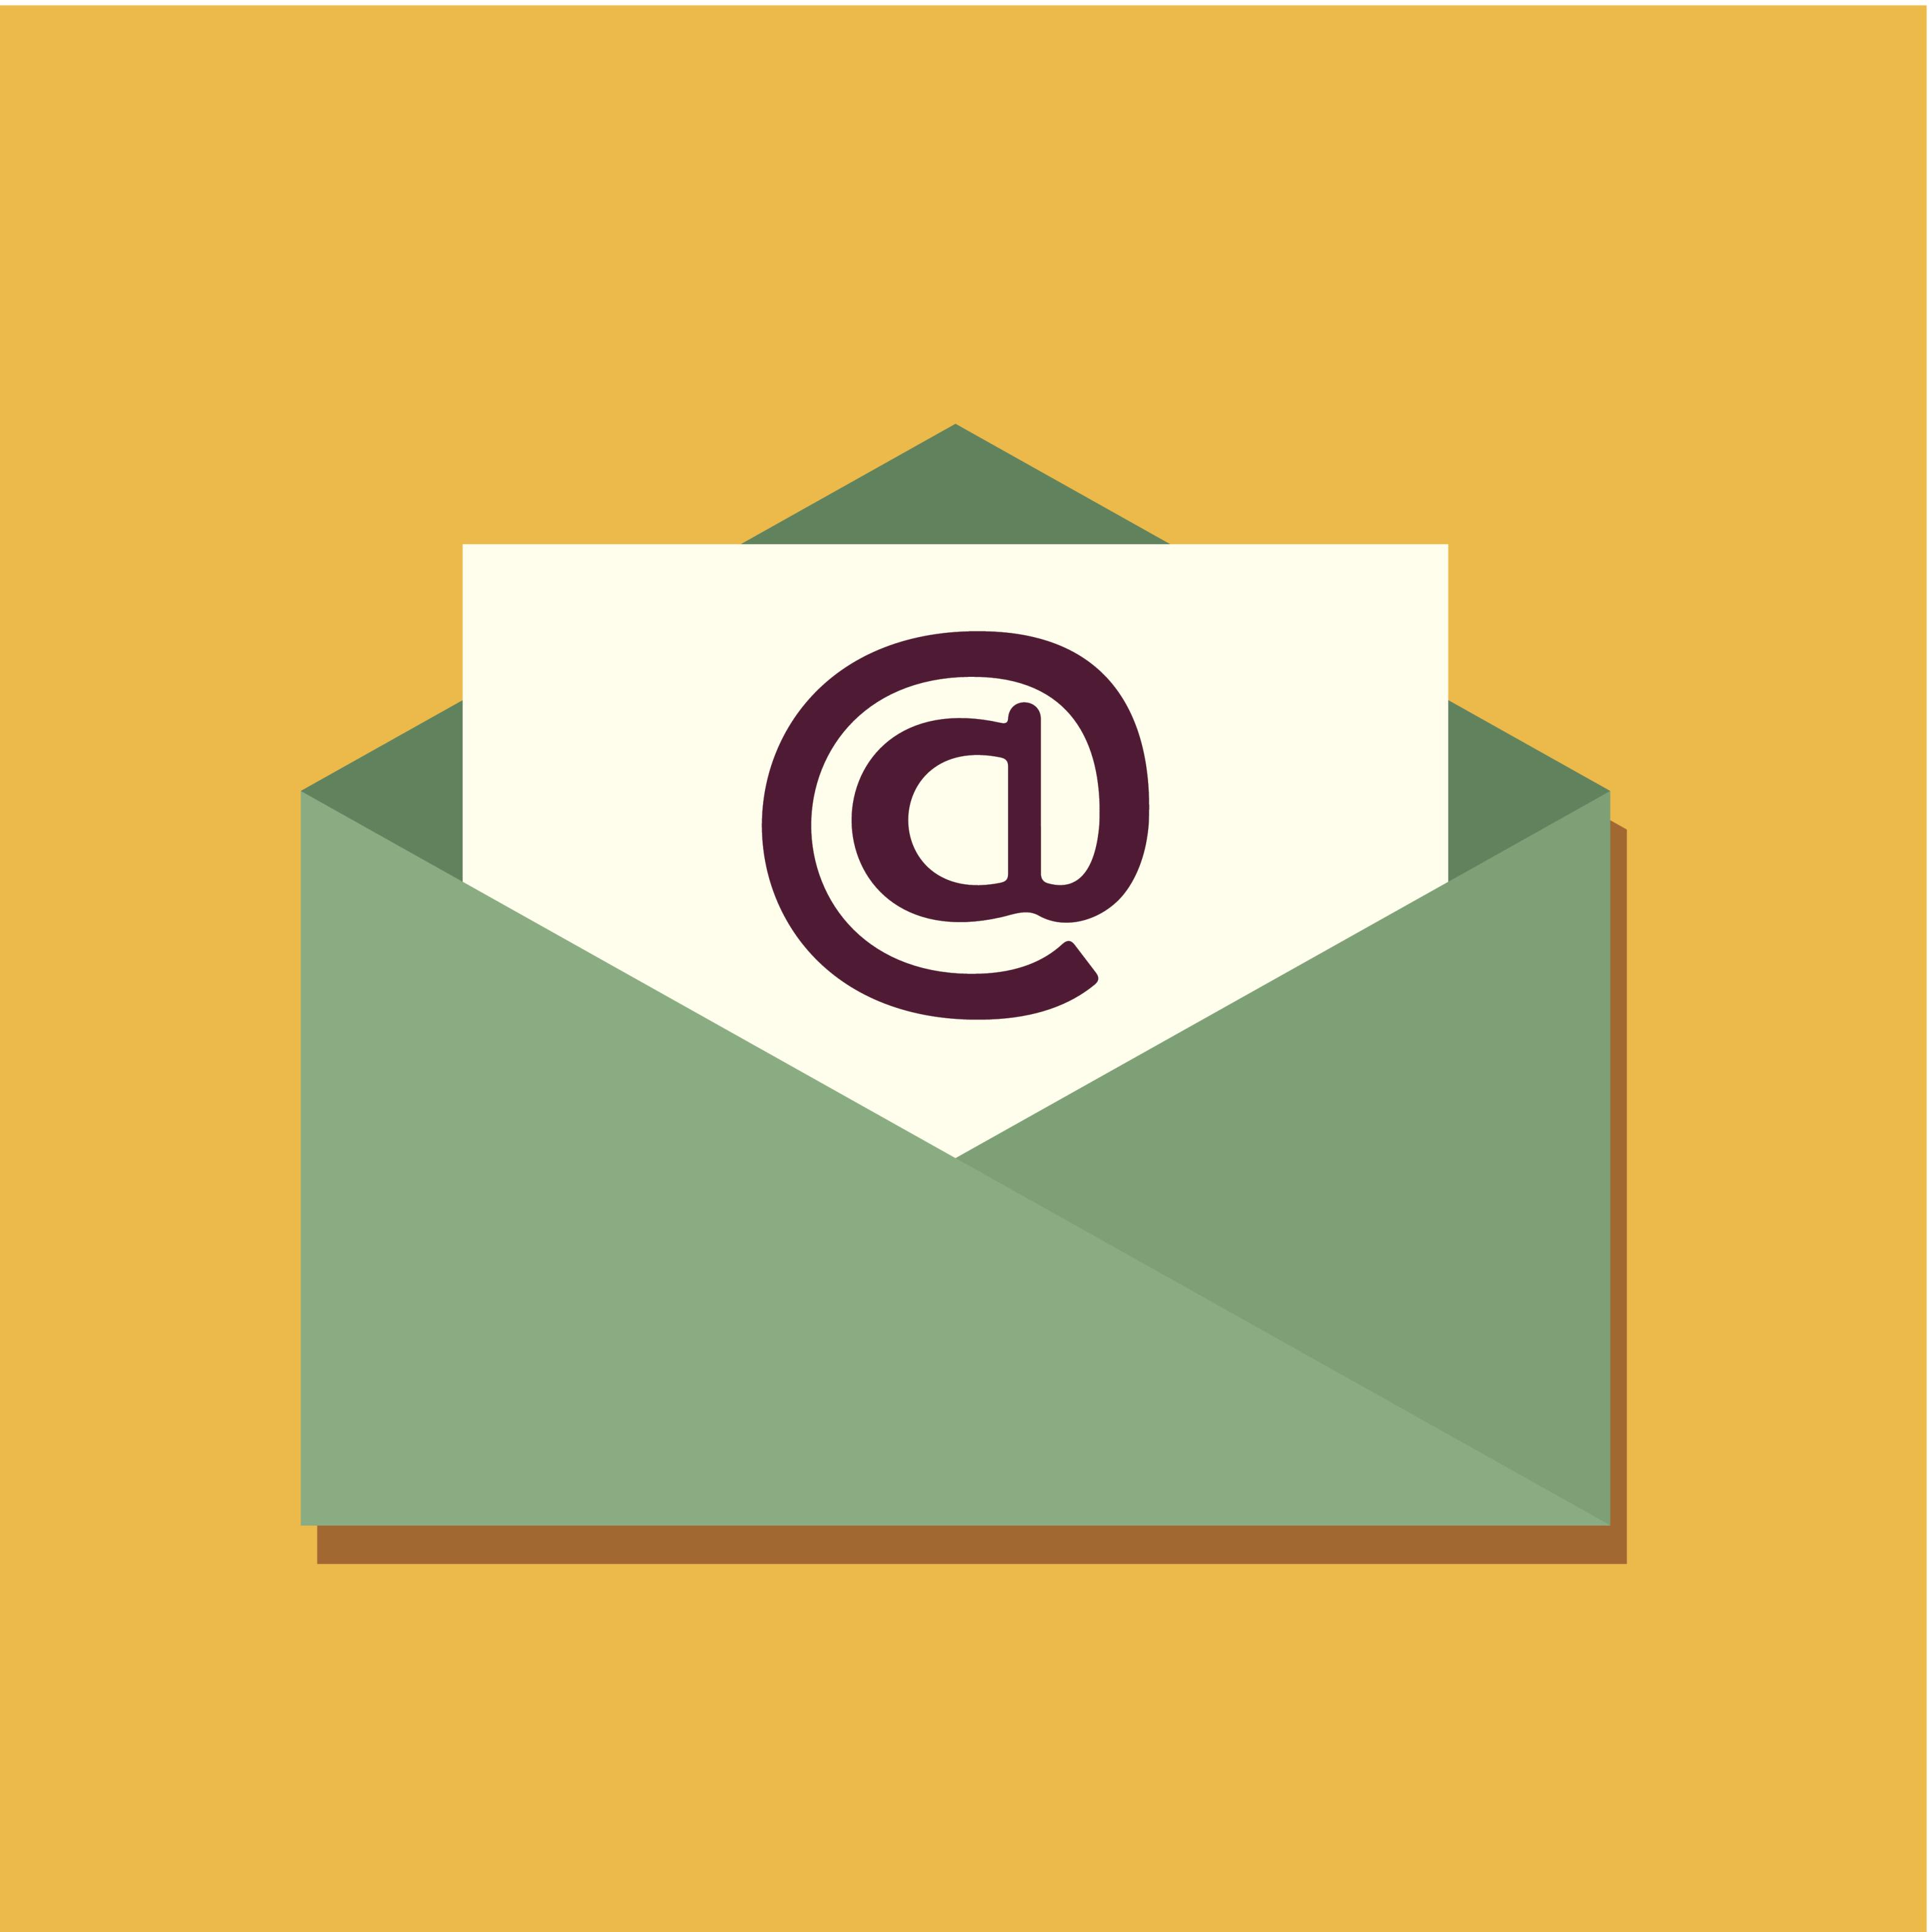 Envelope icon. Email design